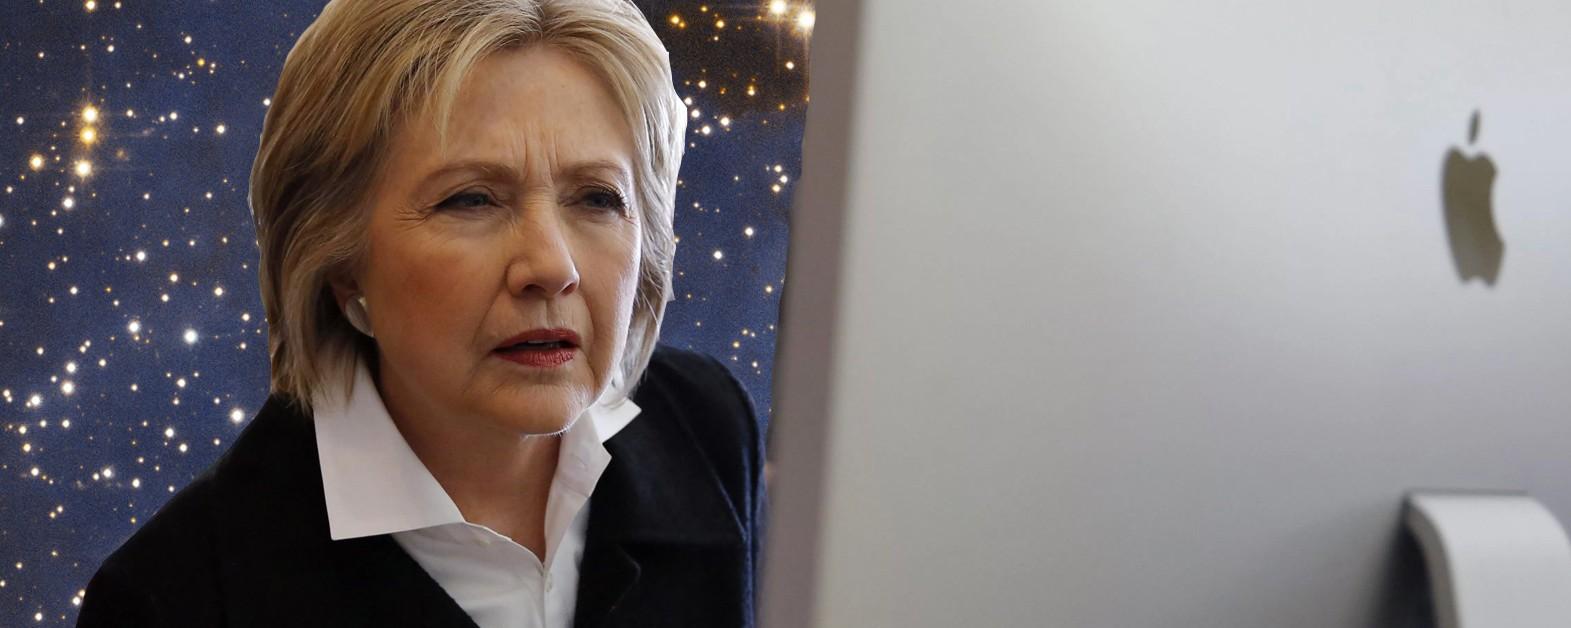 Inside the Bizarre Astrological Drama over Hillary Clinton's Birth ...